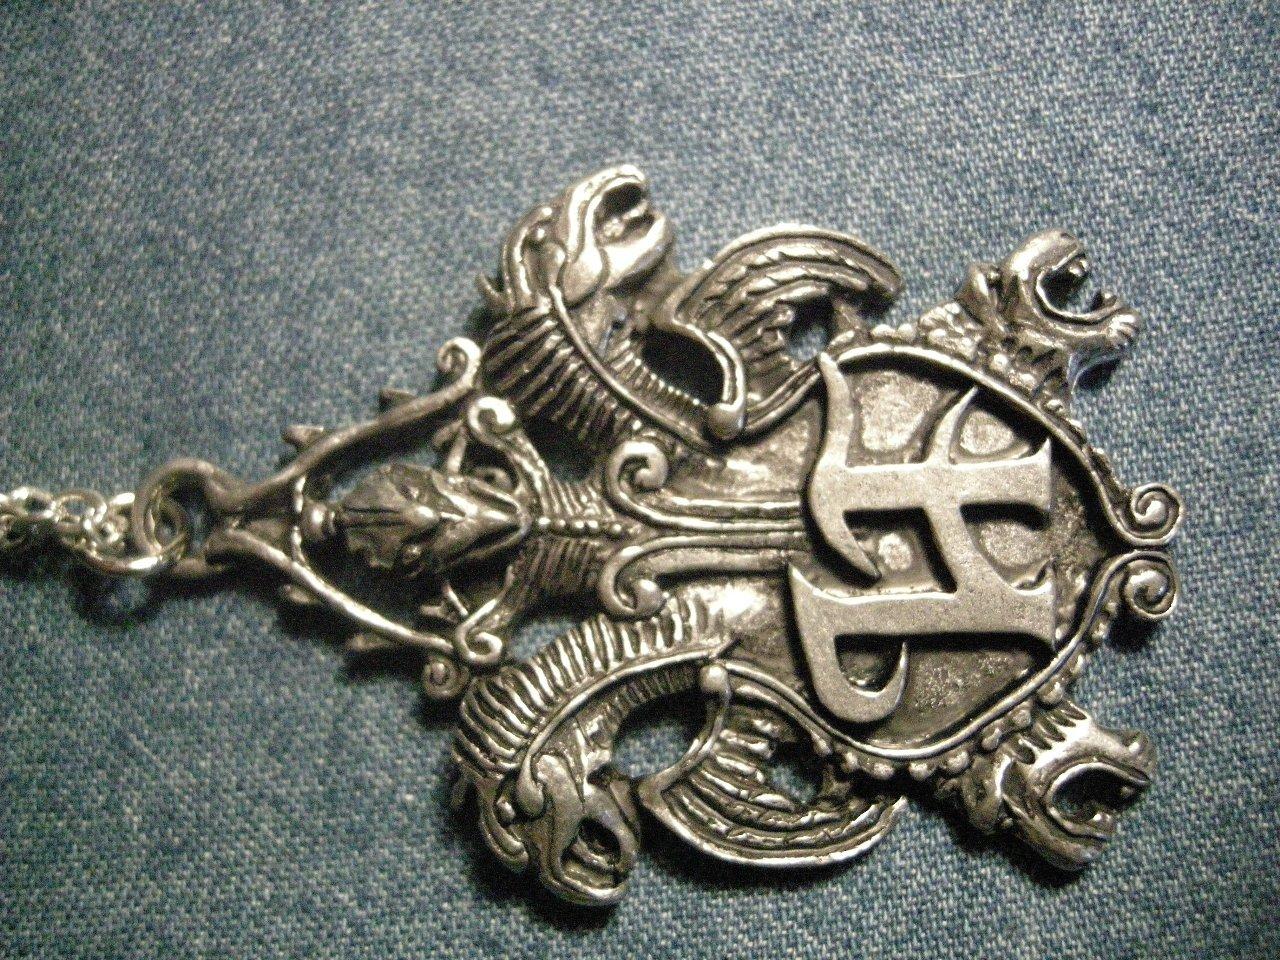 HAMMERFALL METAL NECKLACE dragon crest logo VINTAGE